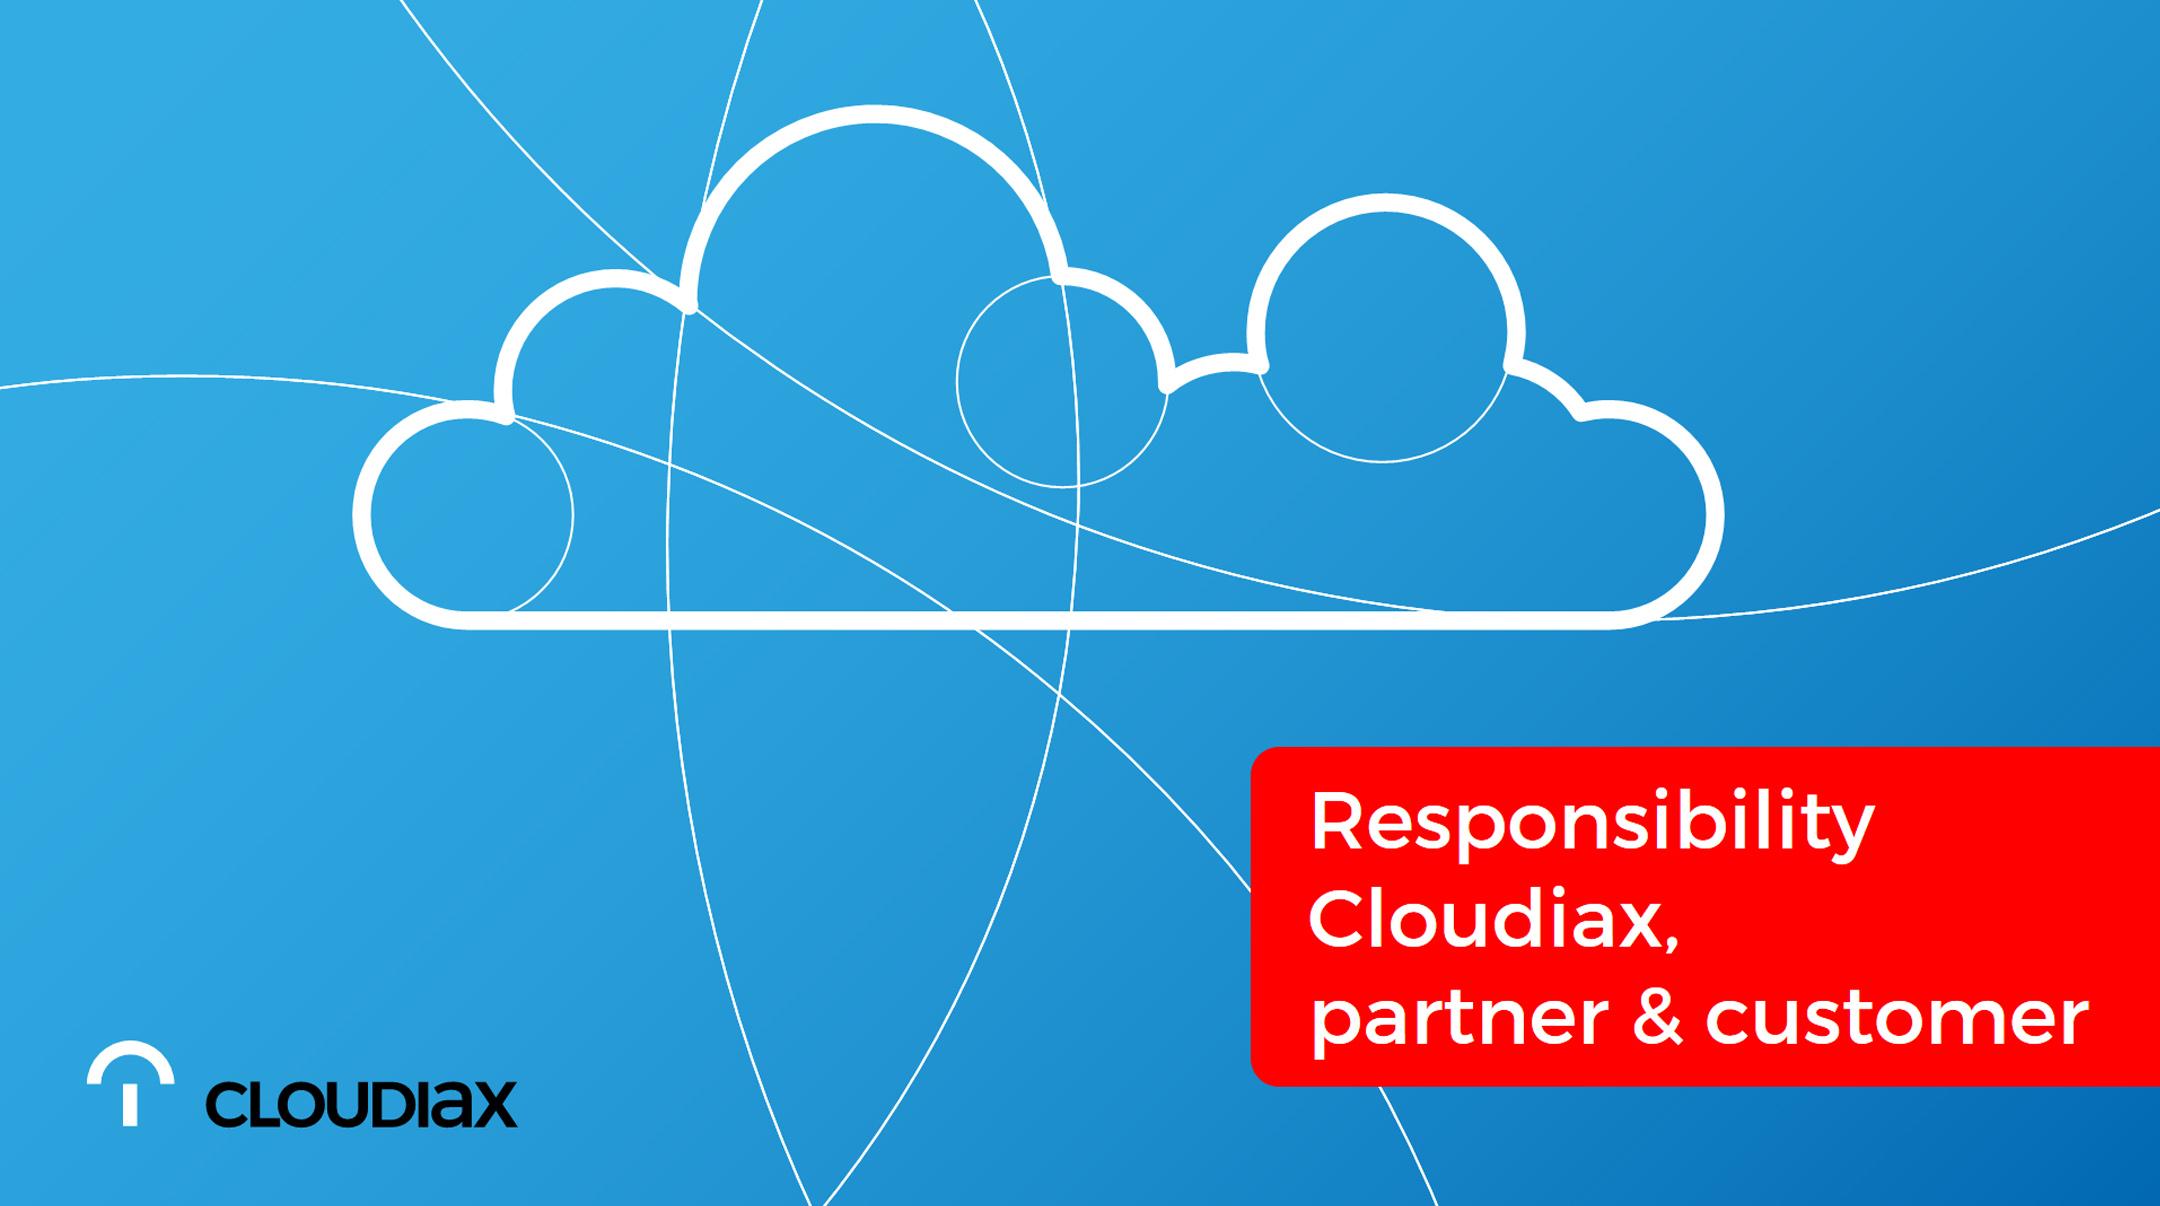 Responsibility Cloudiax, partner & customer